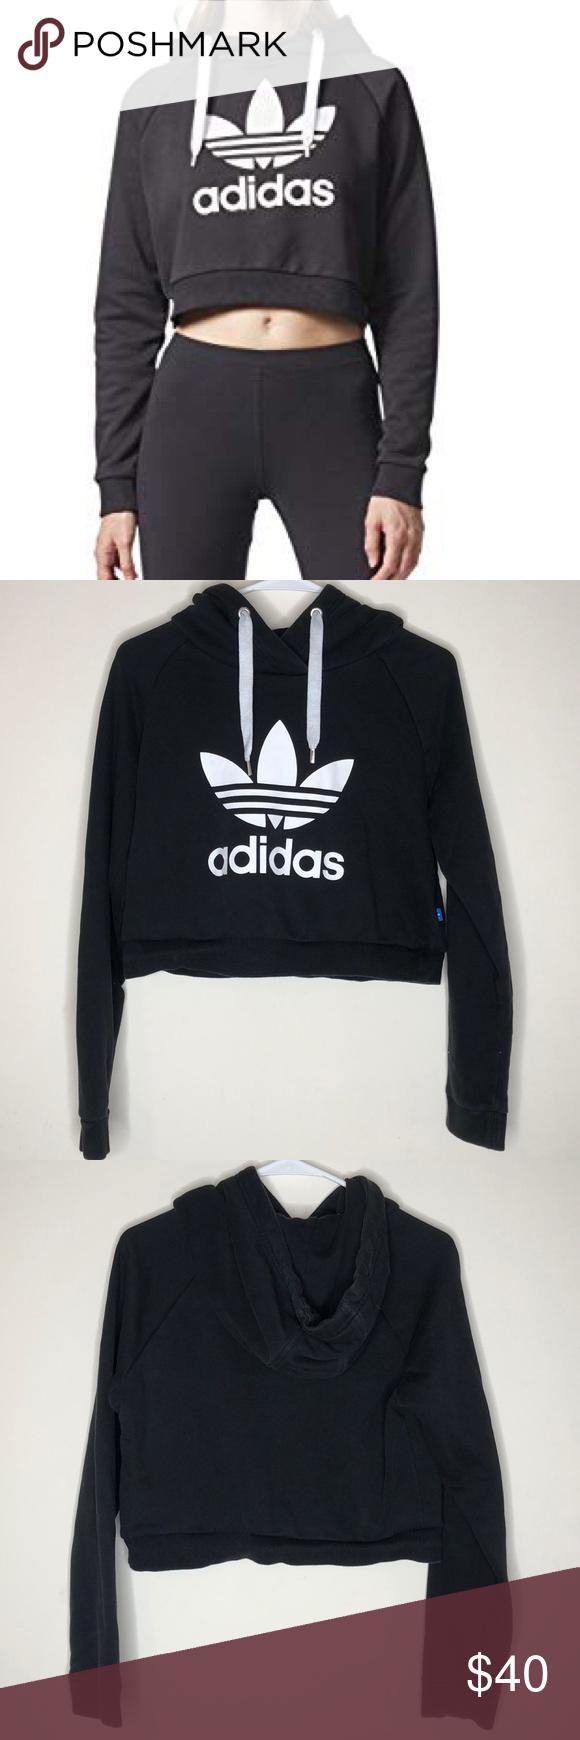 Predownload: Adidas Cropped Hoodie Sweatshirt Crop Sweatshirt Hoodie Adidas Crop Adidas Cropped Hoodie [ 1740 x 580 Pixel ]